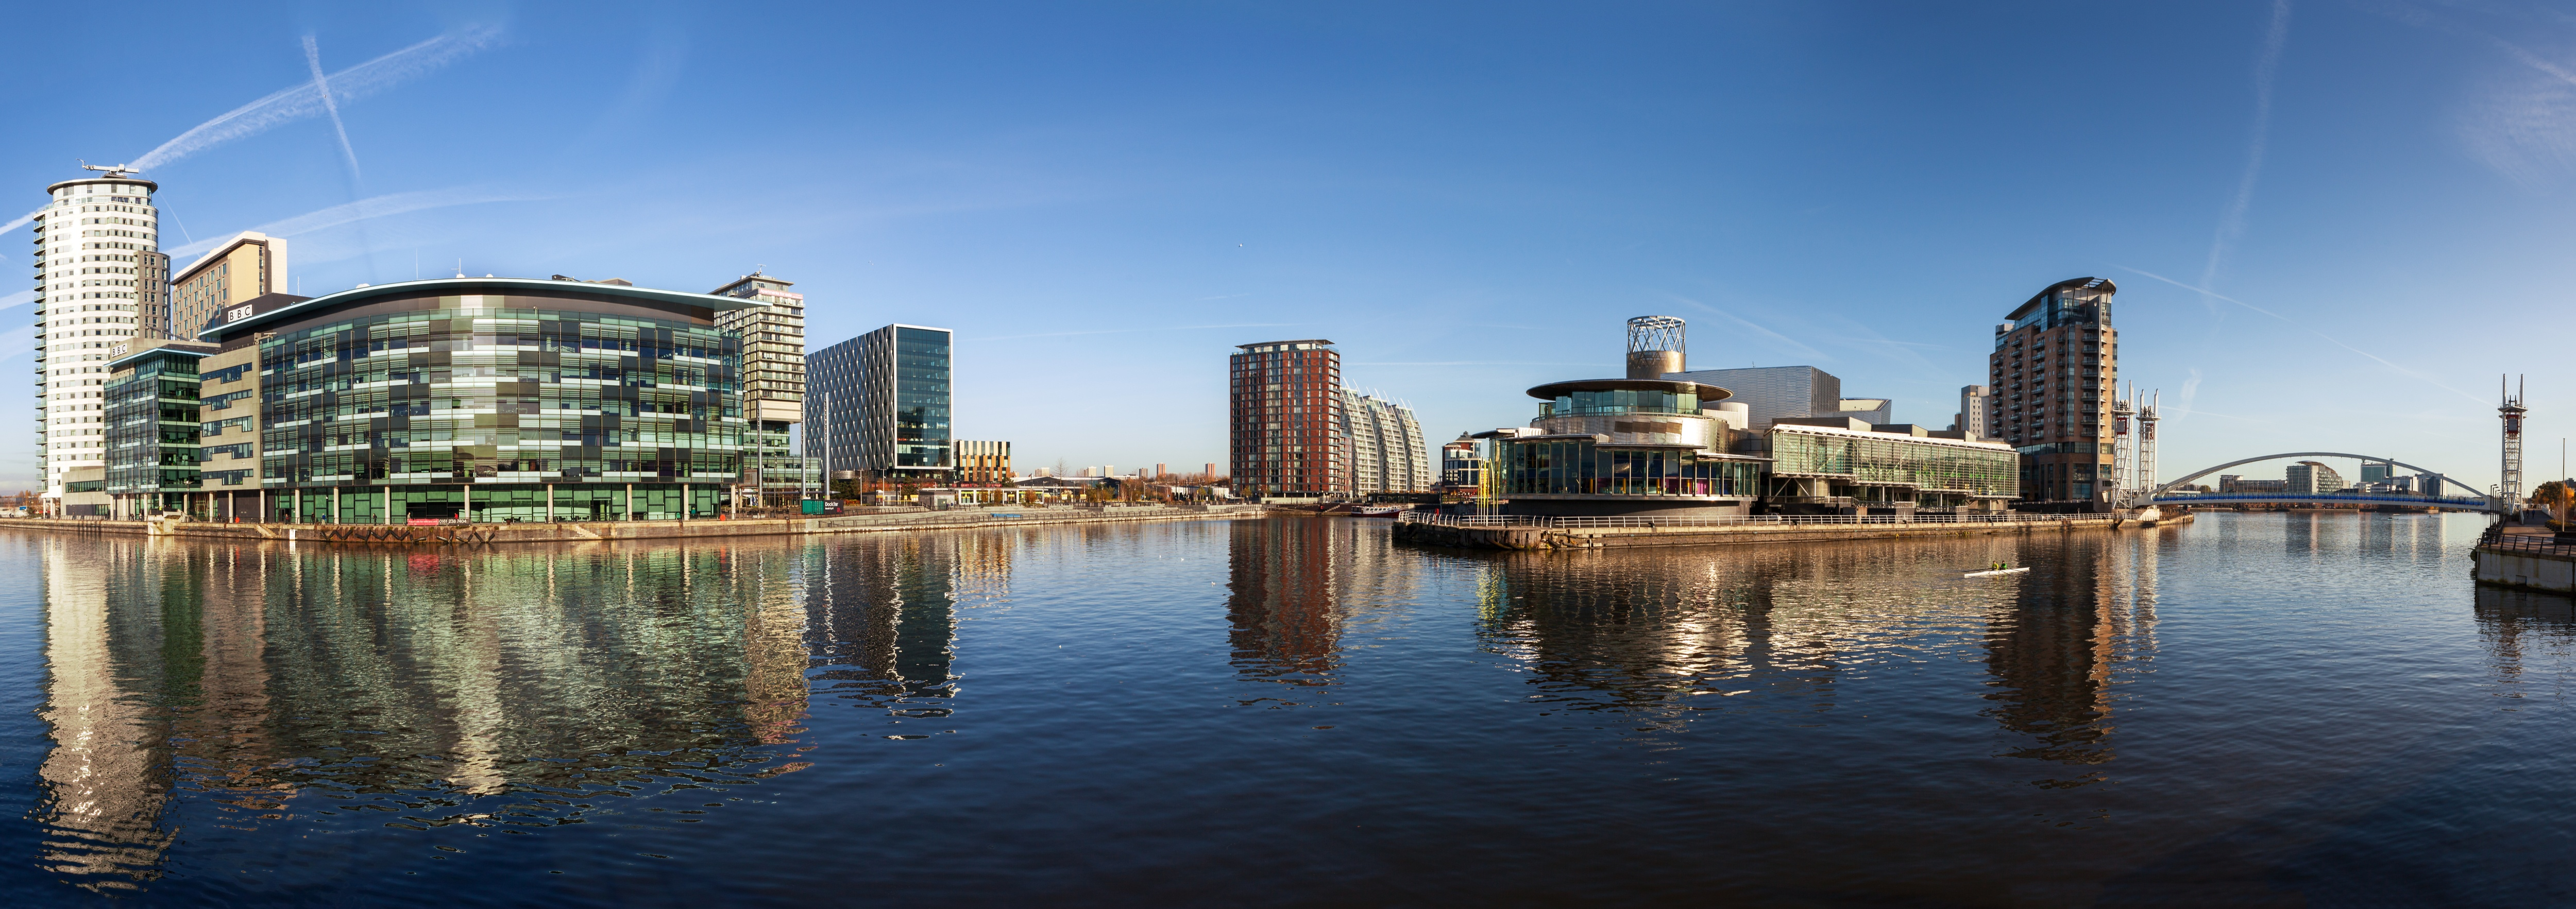 Manchester  skyline 3